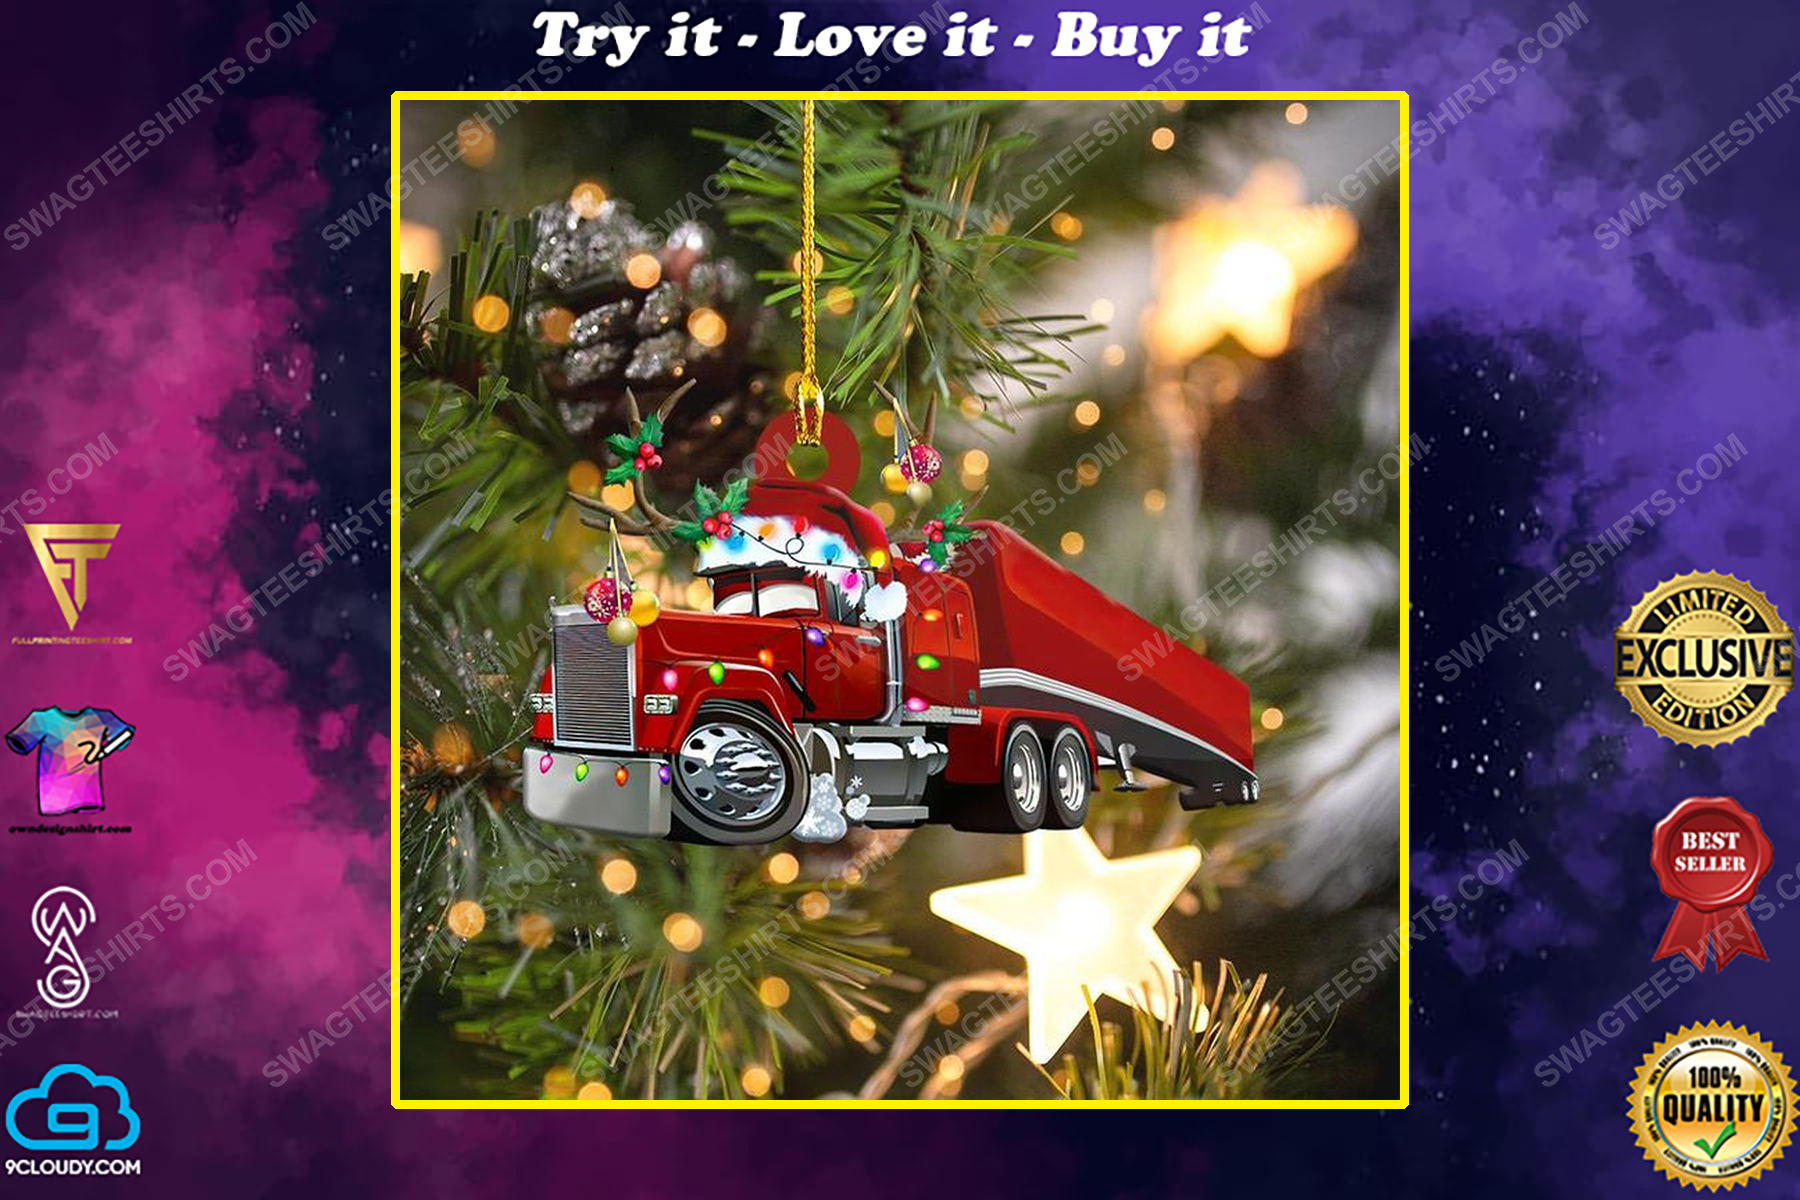 Truck and christmas light christmas gift ornament